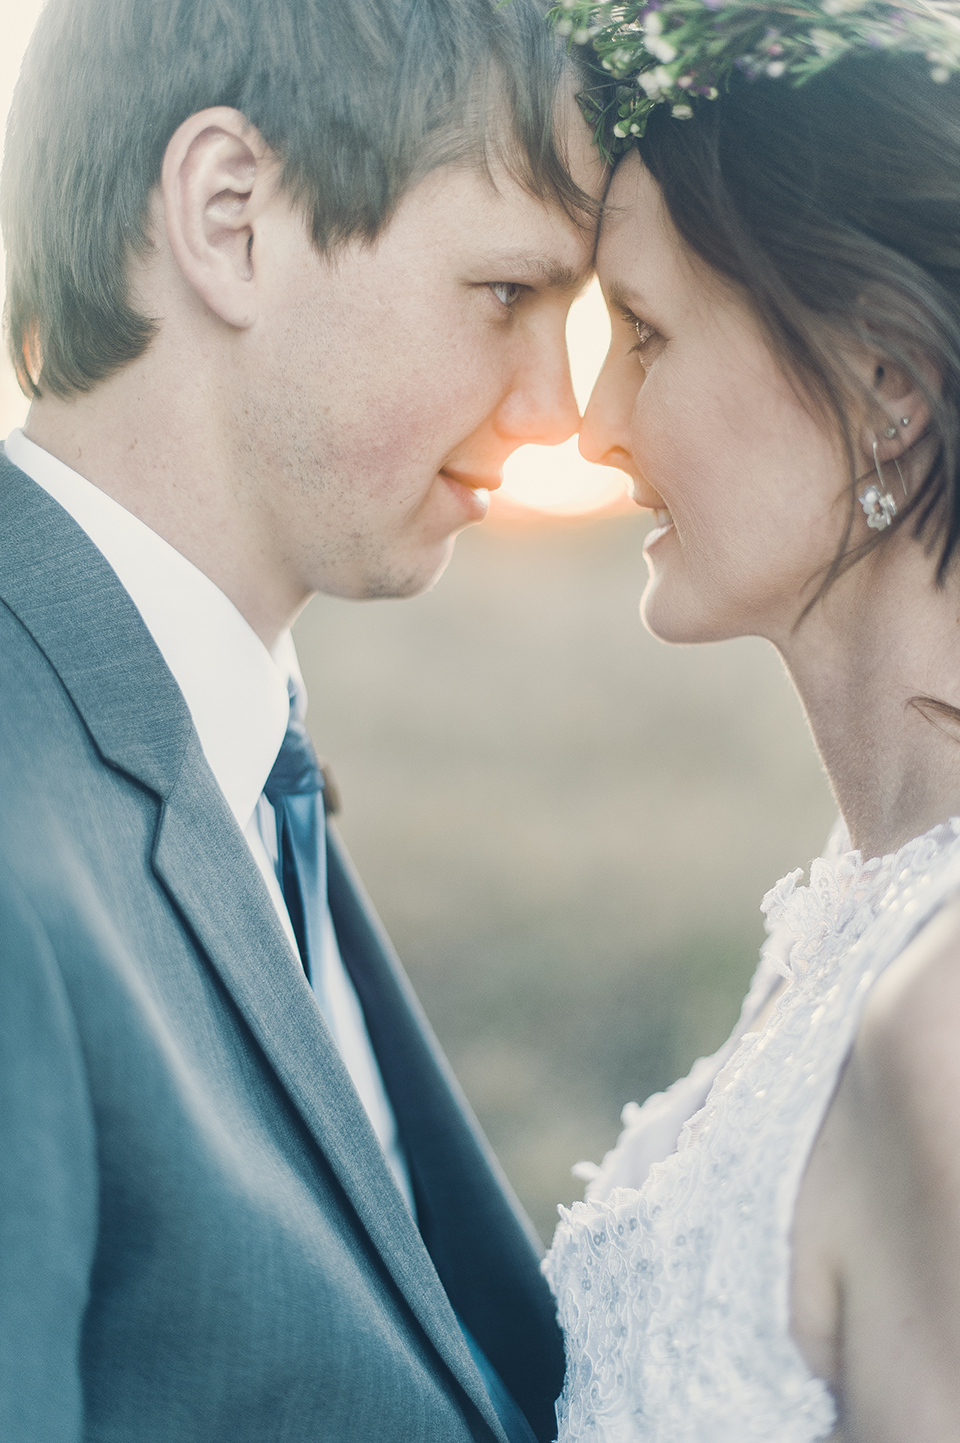 RyanParker_WeddingPhotographer_Pretoria_RosemaryHill_Gauteng_P&R_DSC_6999.jpg